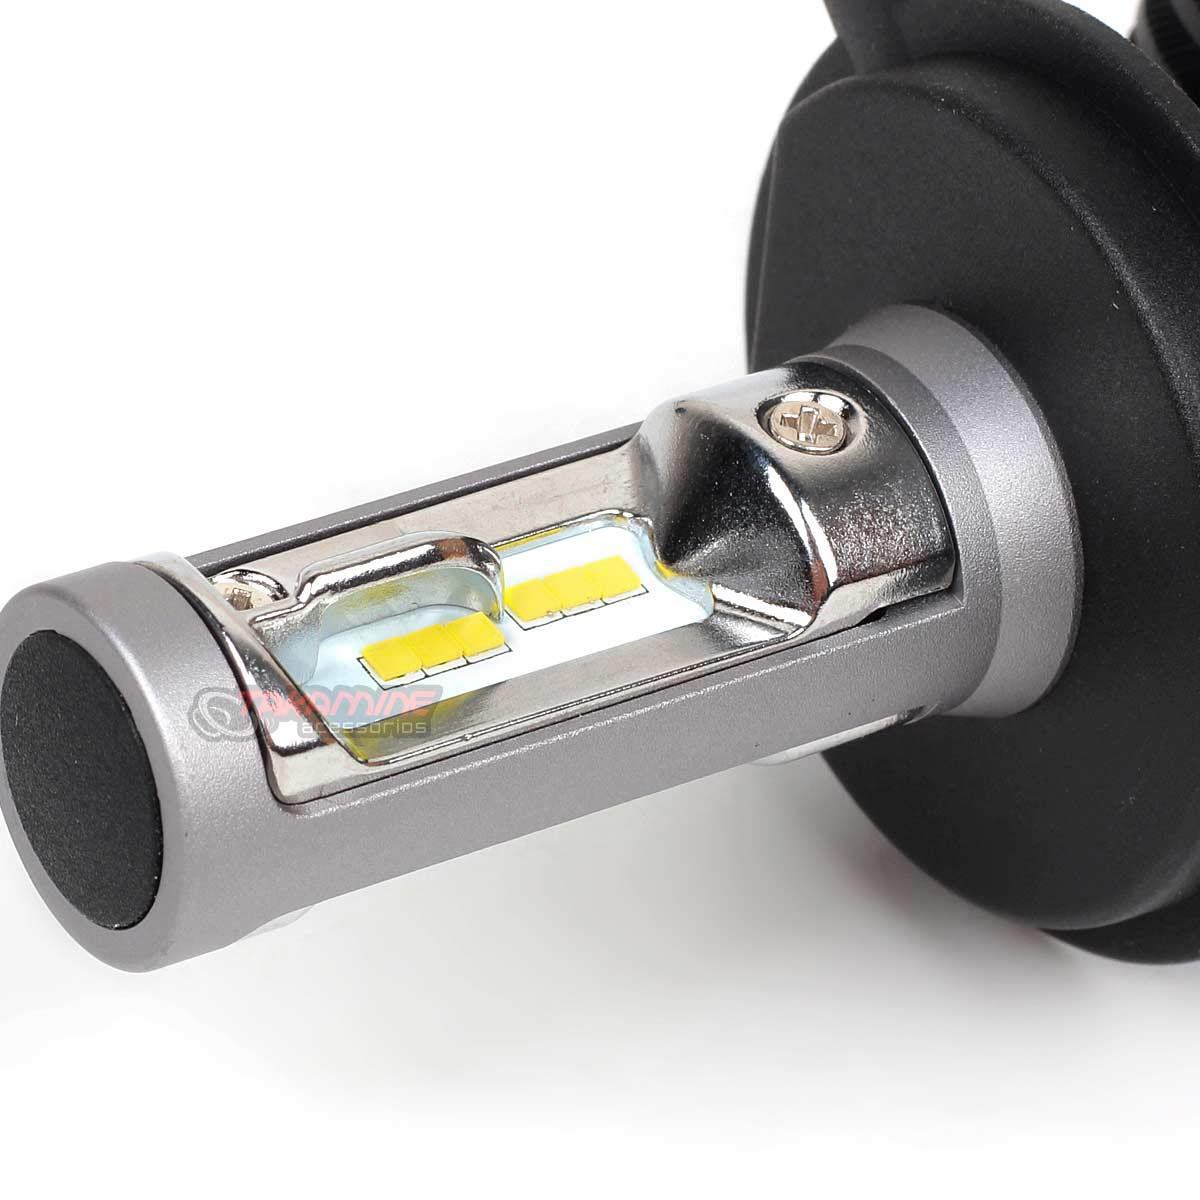 Kit Ultra LED Peugeot 206 2001 até 2009 tipo xenon farol alto e baixo H4 50W